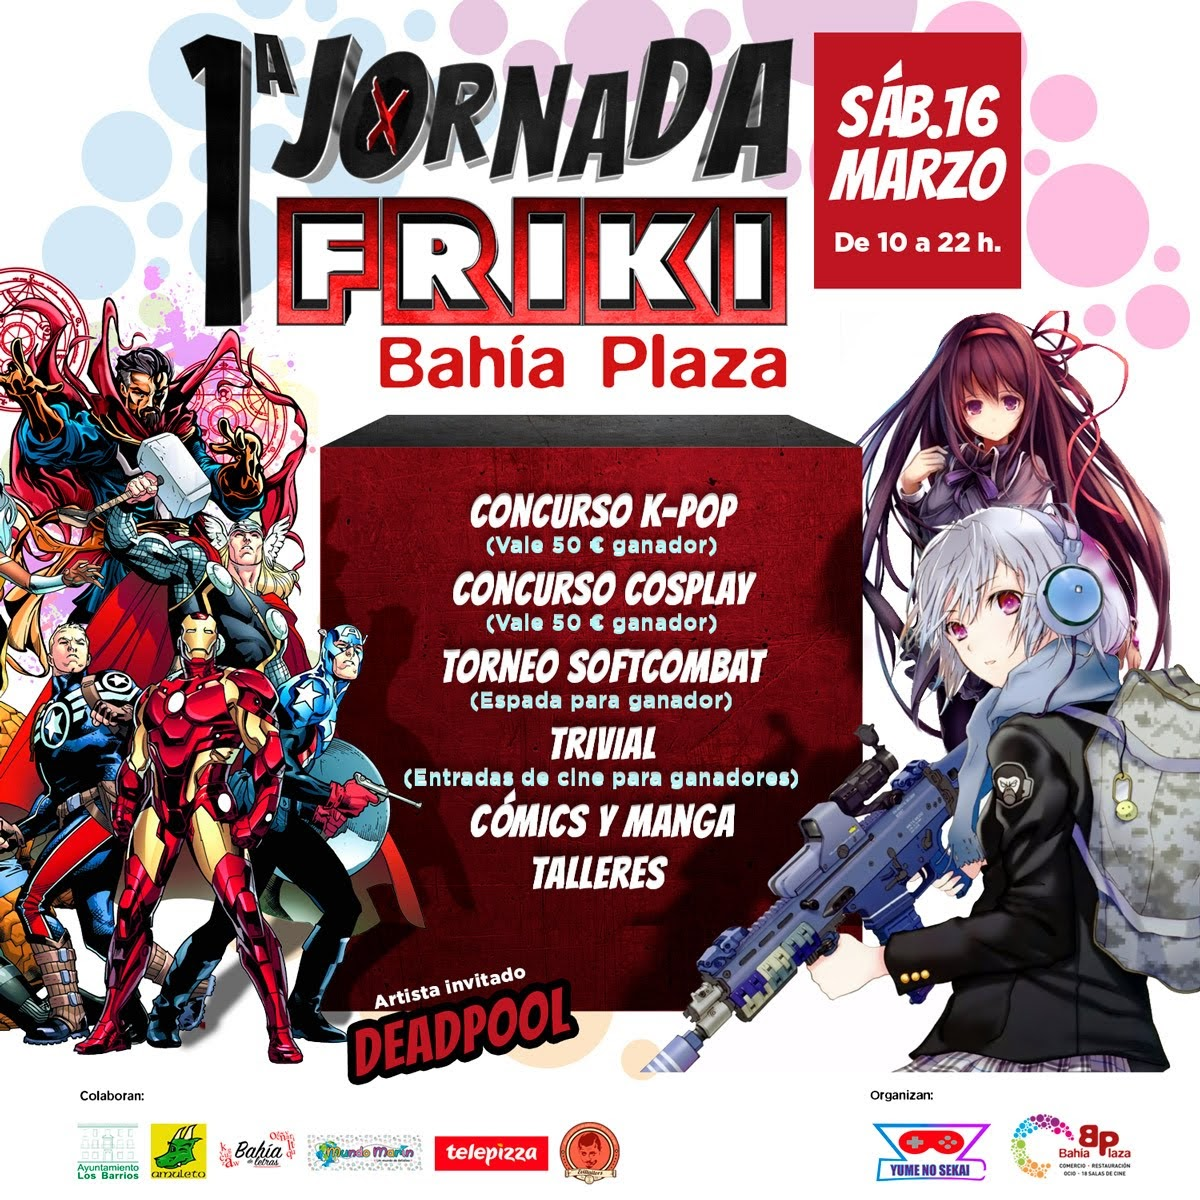 Bahía Plaza celebra este sábado su primera Jornada Friki con Deadpool como artista invitado